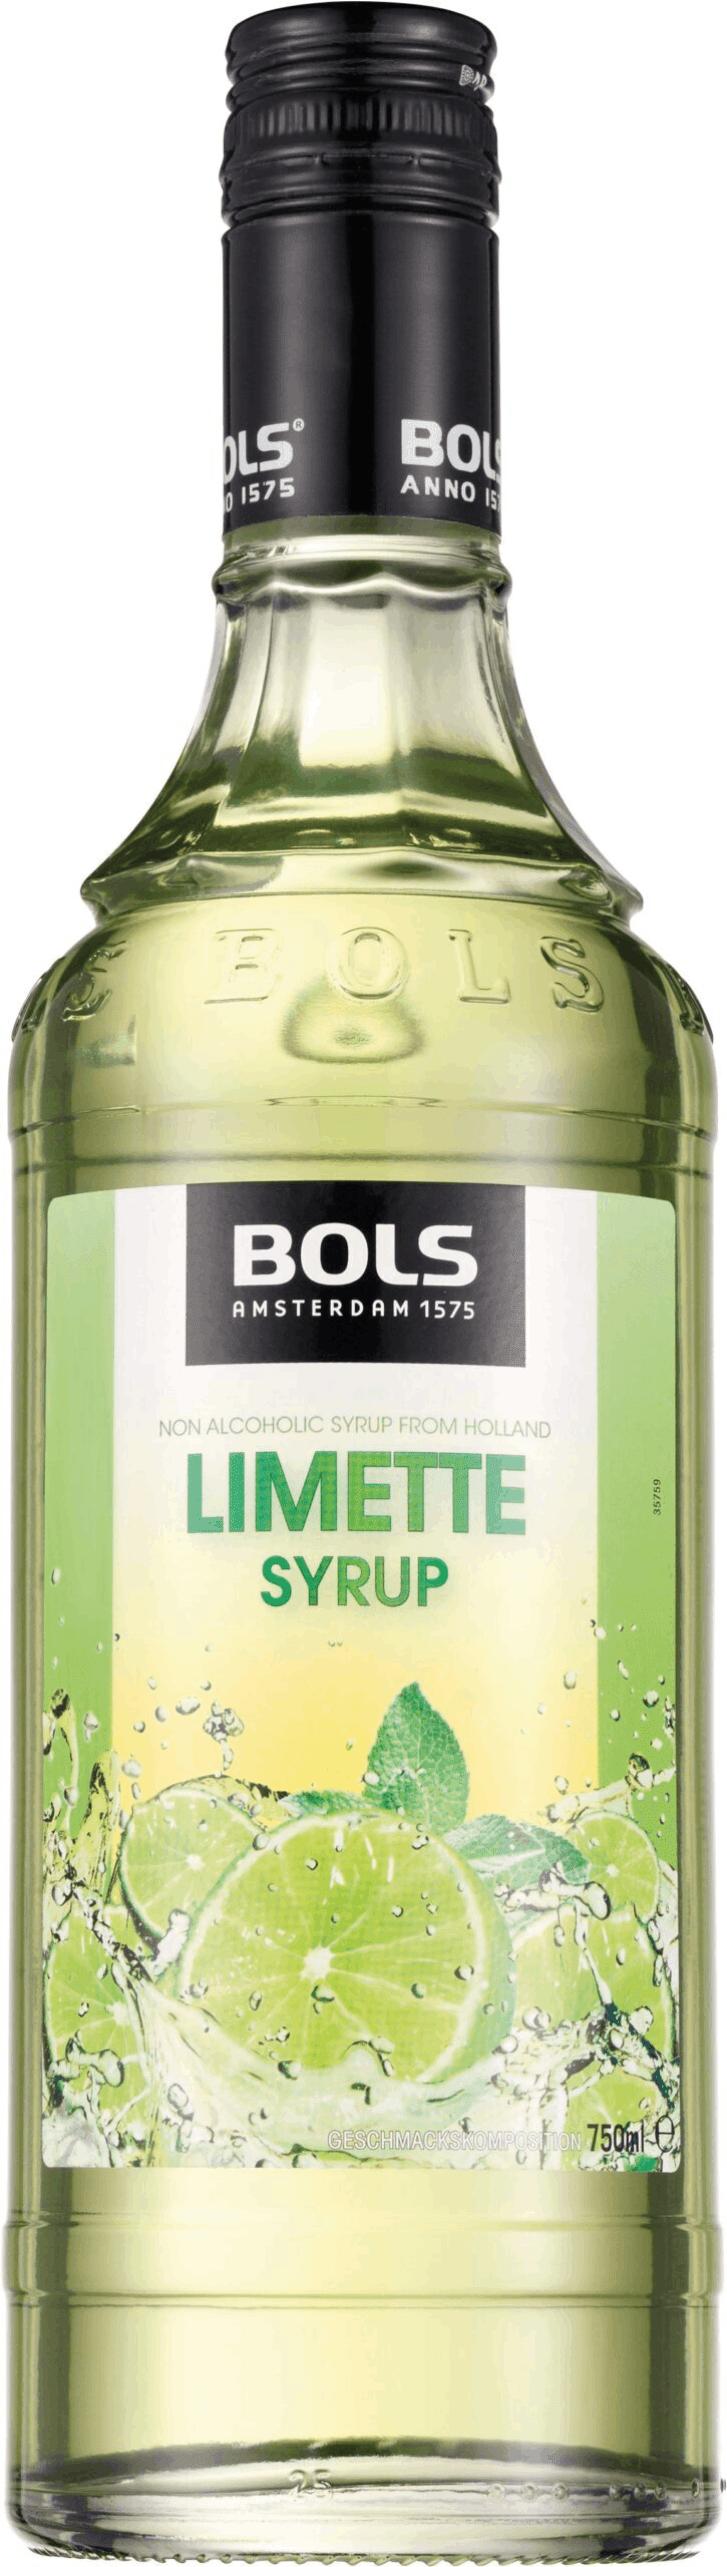 Bols Limette sirup 0,7L